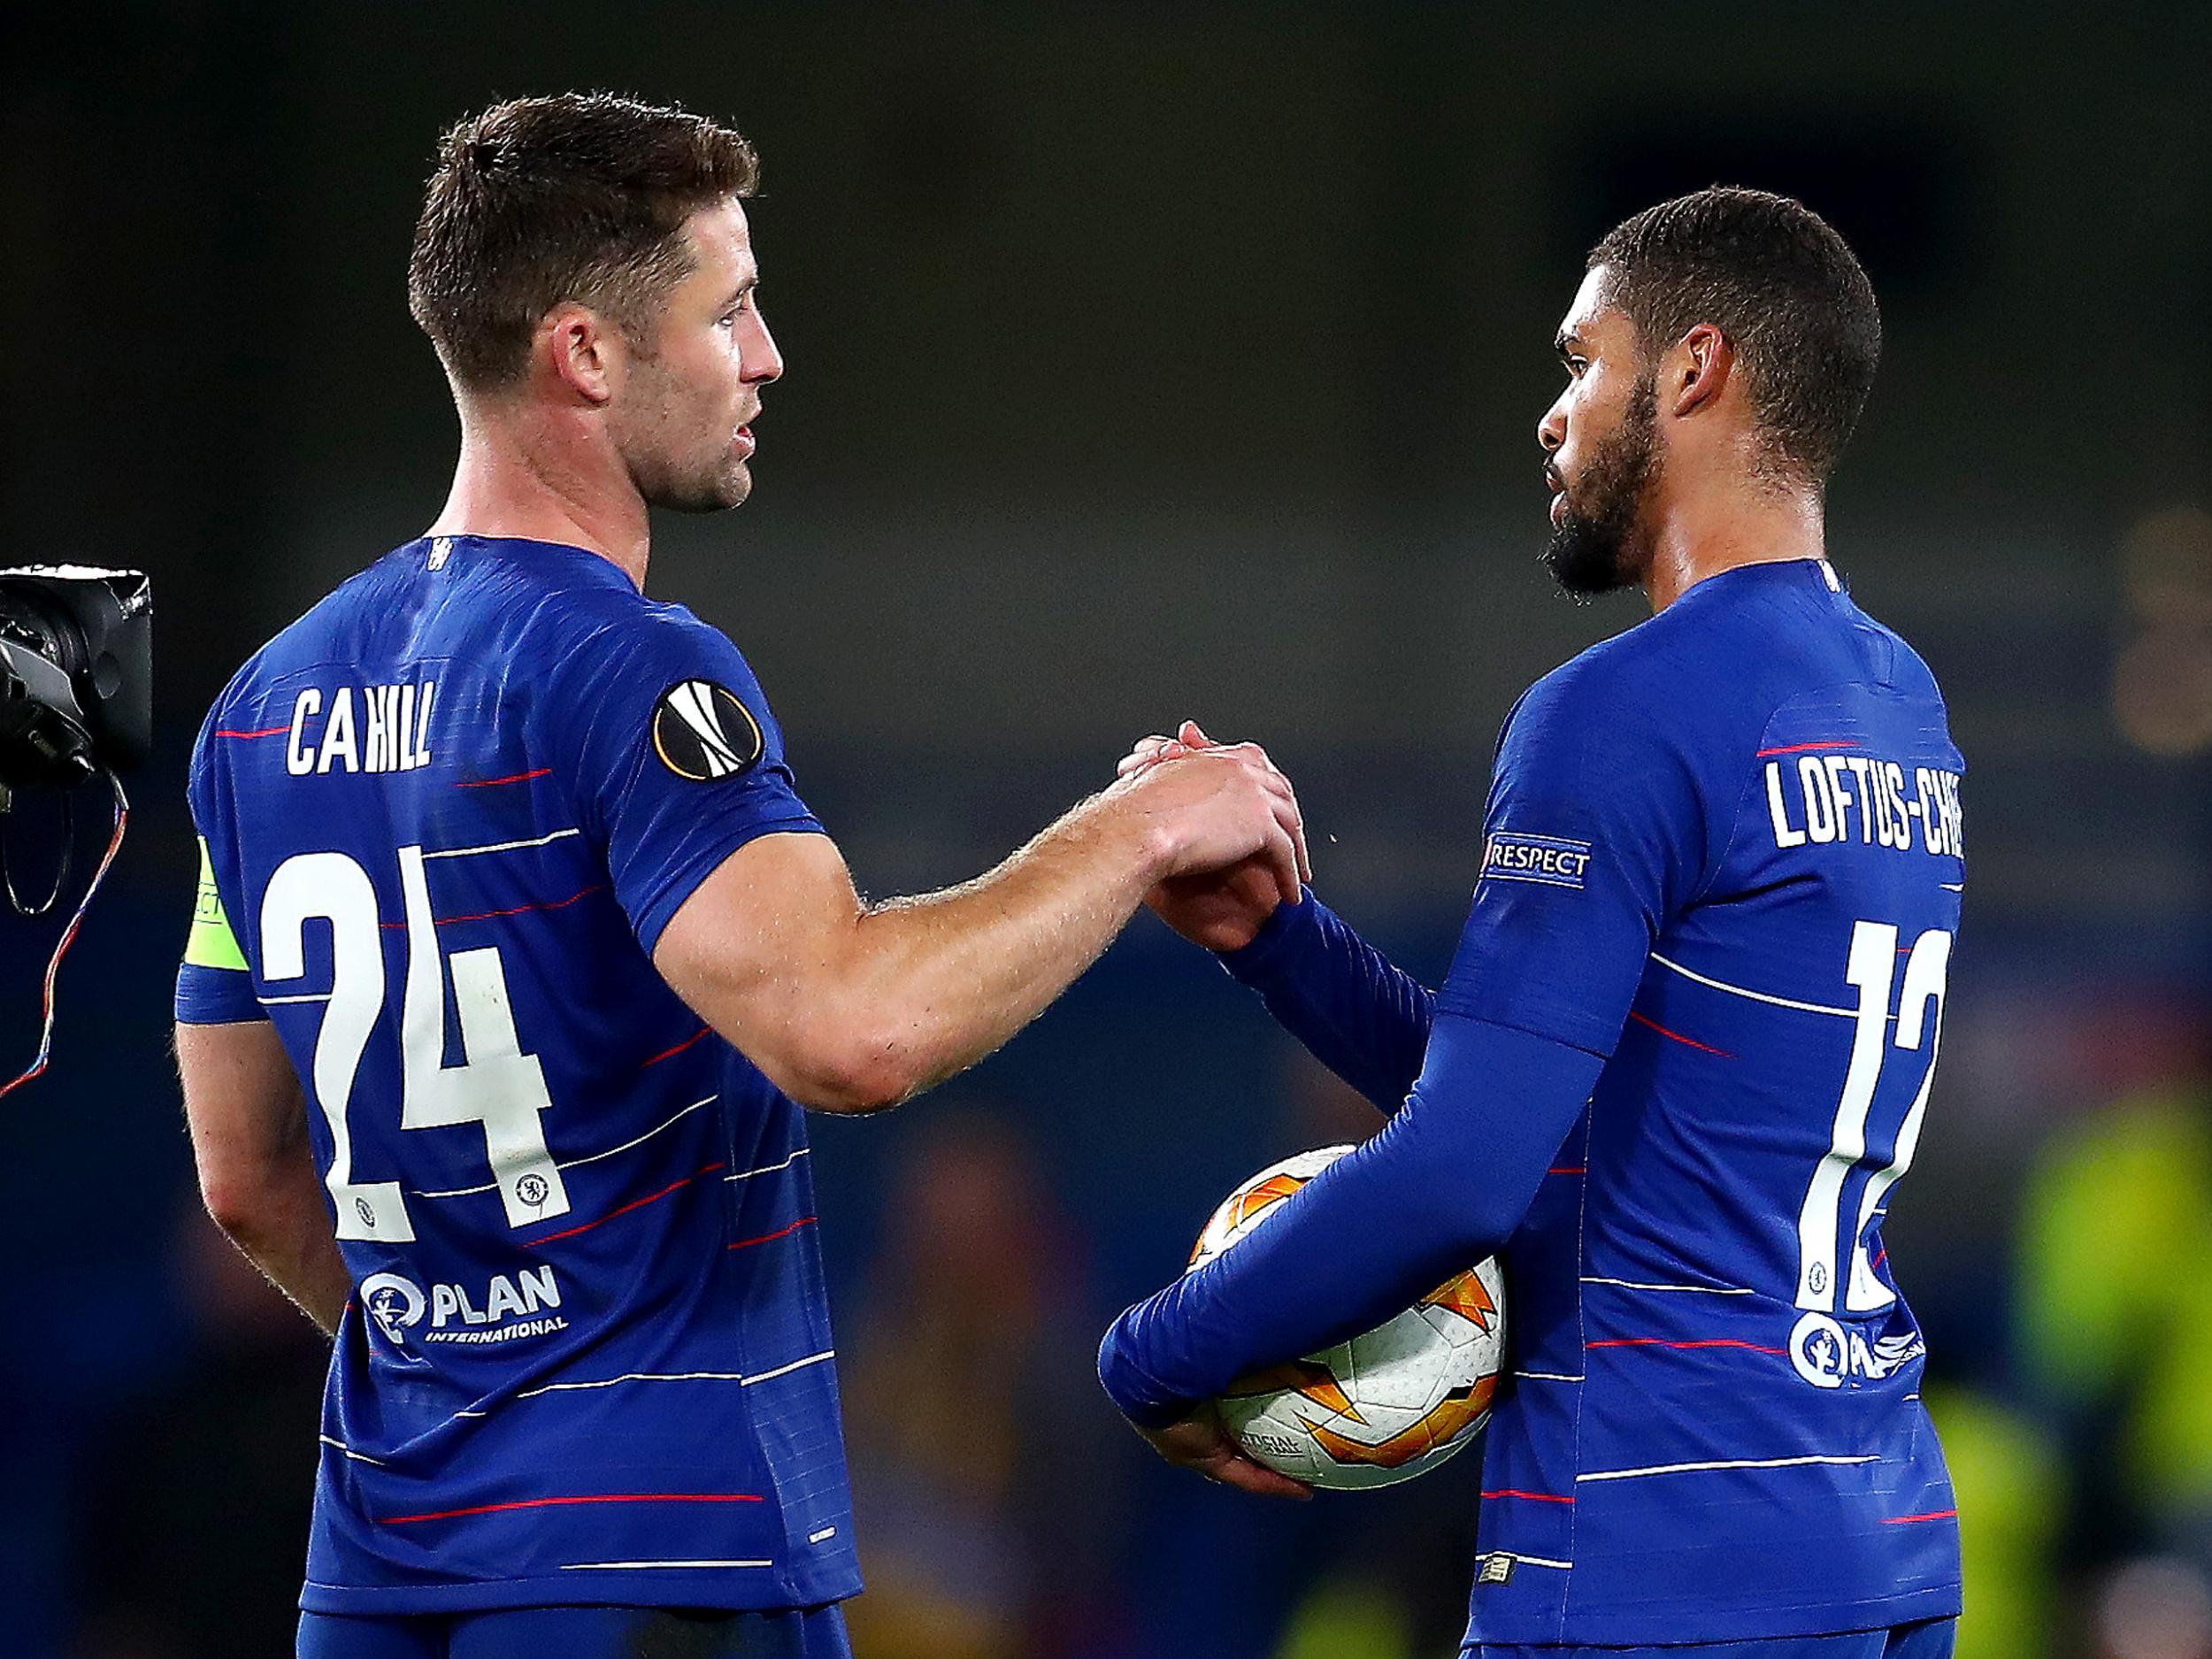 Ruben Loftus-Cheek shows off the weapon Maurizio Sarri cannot ignore in fight for Chelsea midfield berth